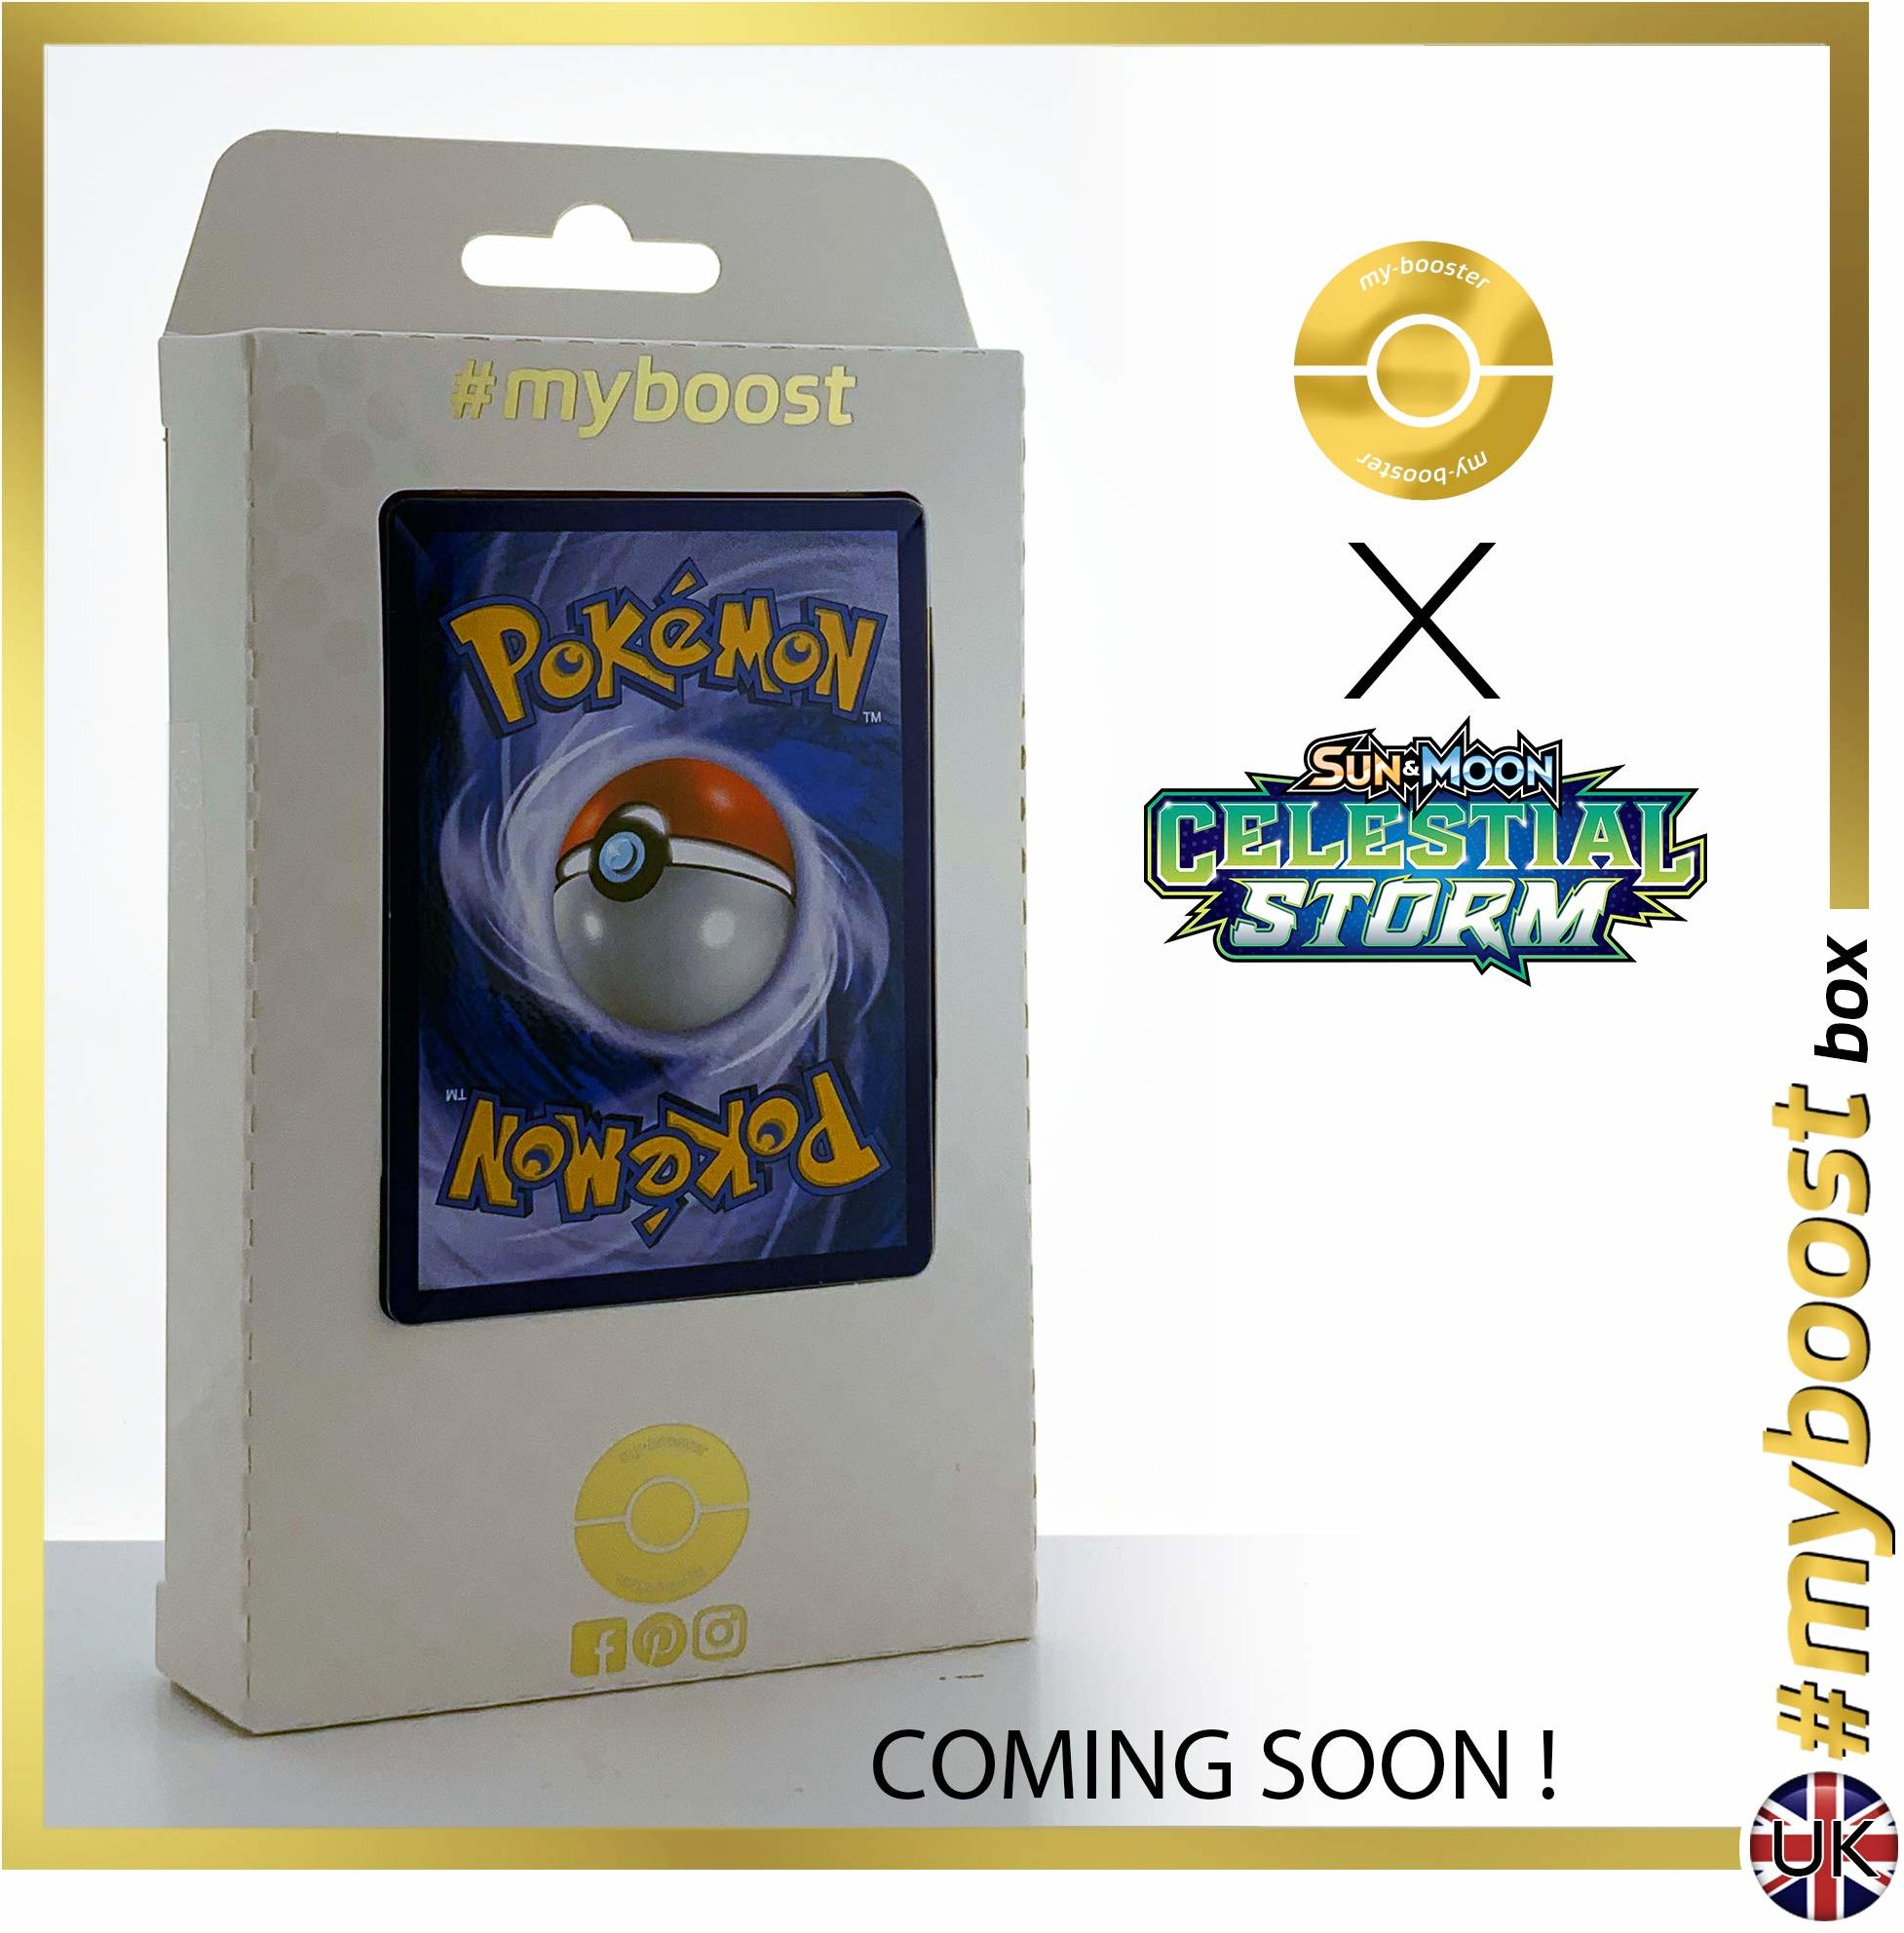 Solgaleo 99/168 Holo Reverse - #myboost X Sun & Moon 7 Celestrial Storm - pudełko 10 angielskich kart pokemon